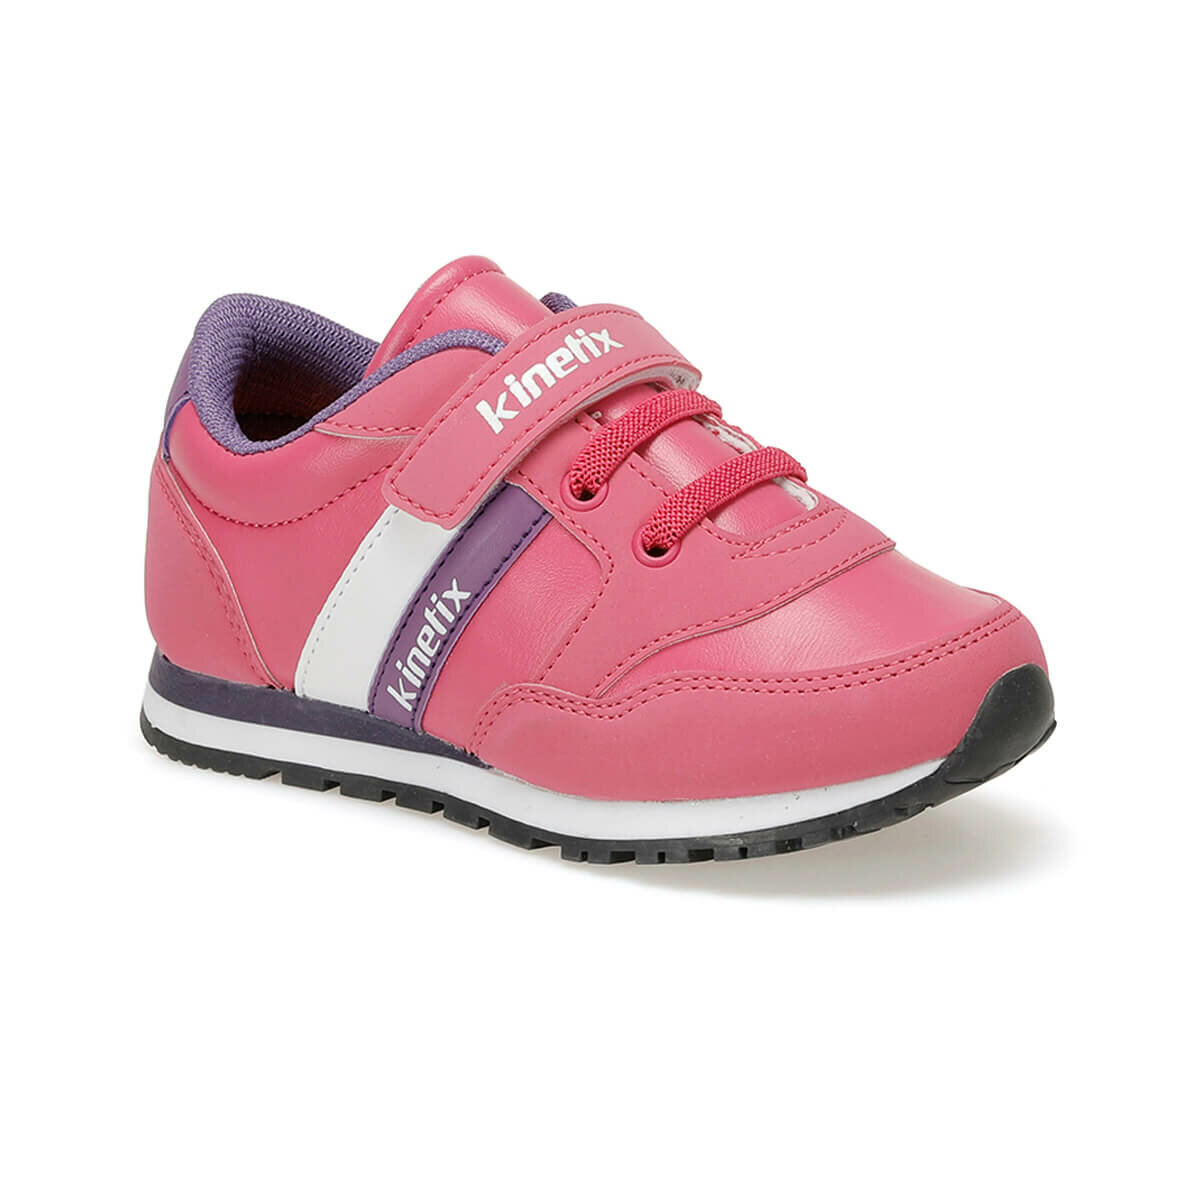 FLO PAYOF PU 9PR Fuchsia Female Child Sneaker Shoes KINETIX